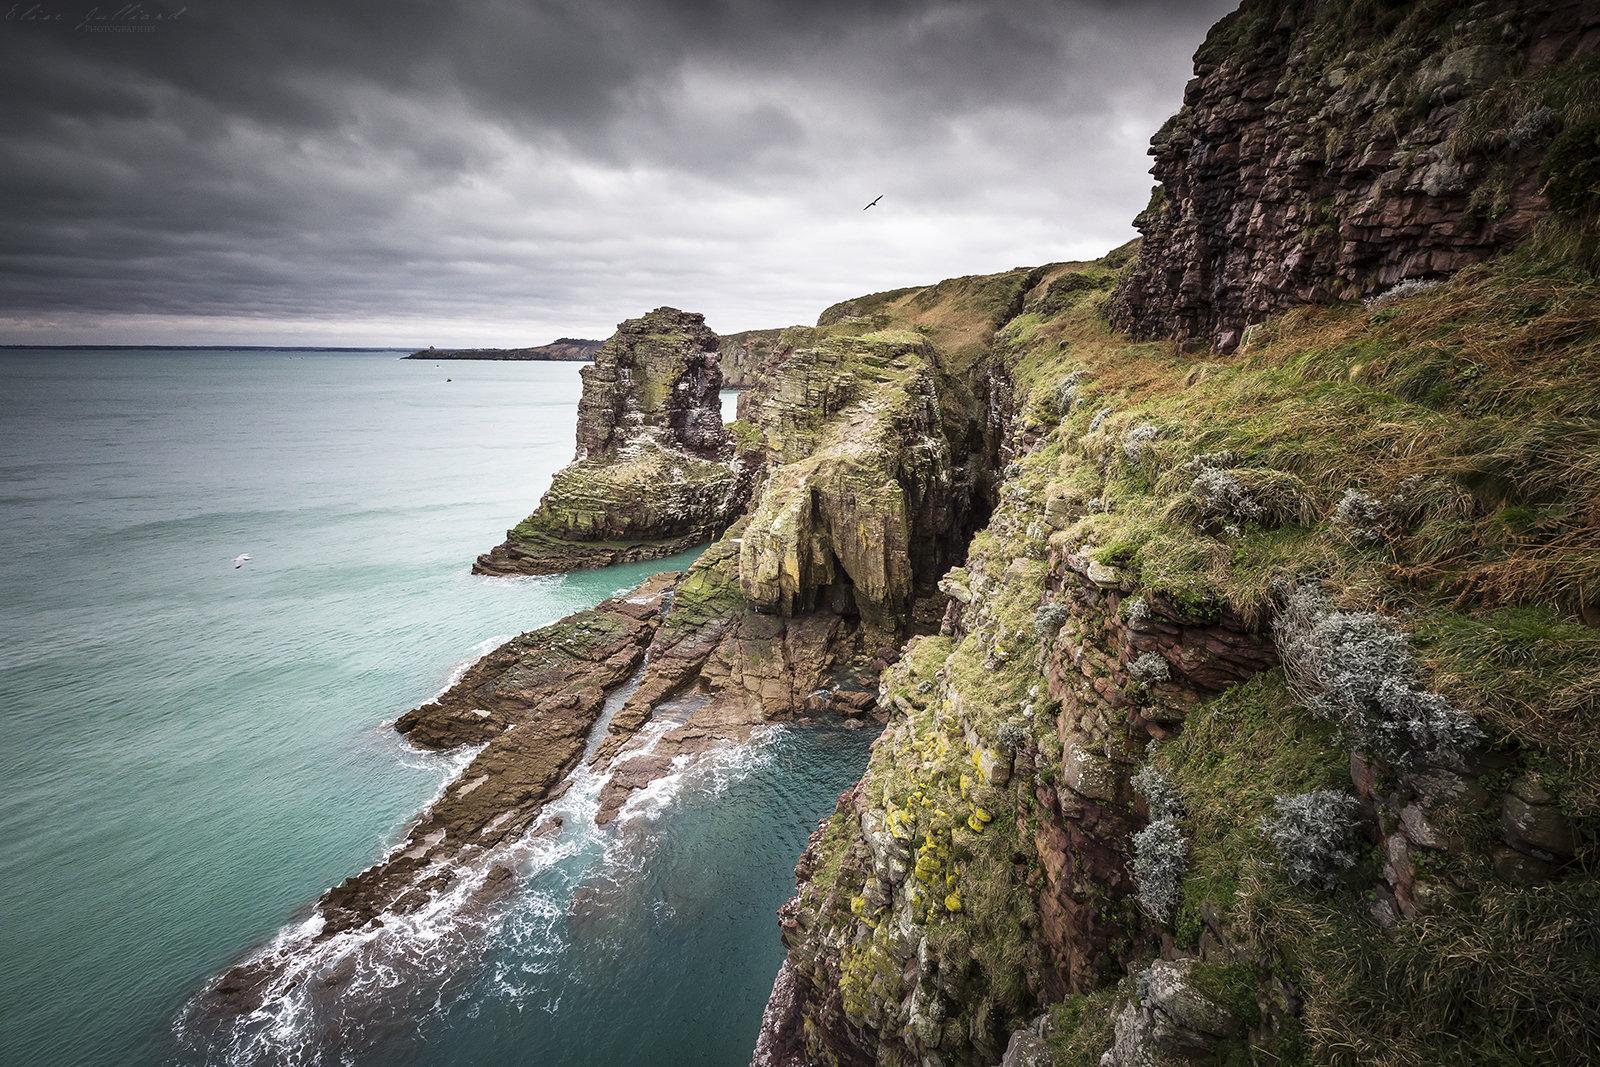 elise-julliard-photographe-lyon-rhone-alpes-photo-paysage-bretagne-cap-frehel-cote-armor-france-nord-falaise-la-manche